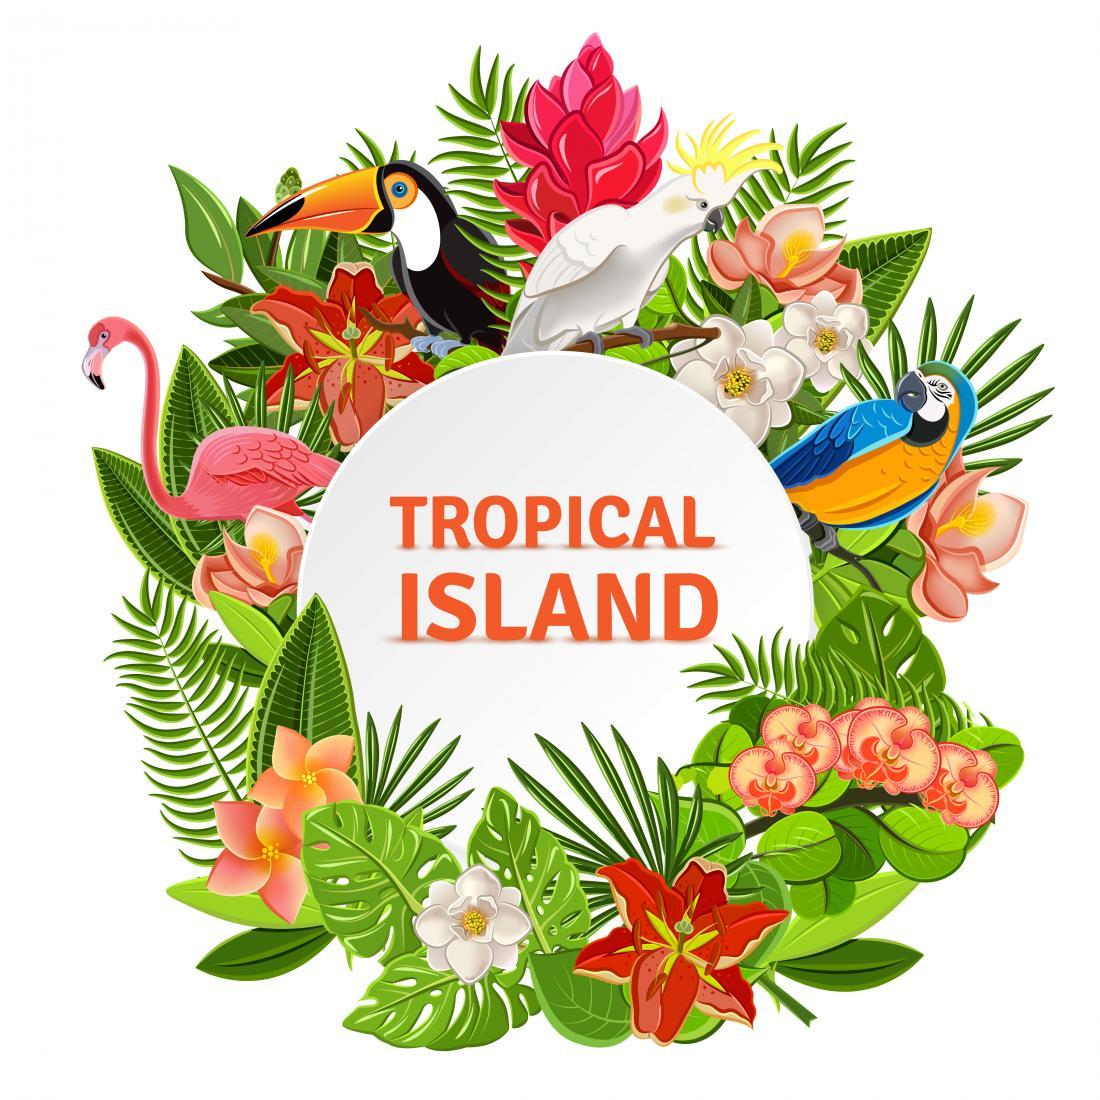 "Экзотические, релакс-массажи и массажи для похудения от 8 руб. в Spa-салоне ""Tropical Island"""